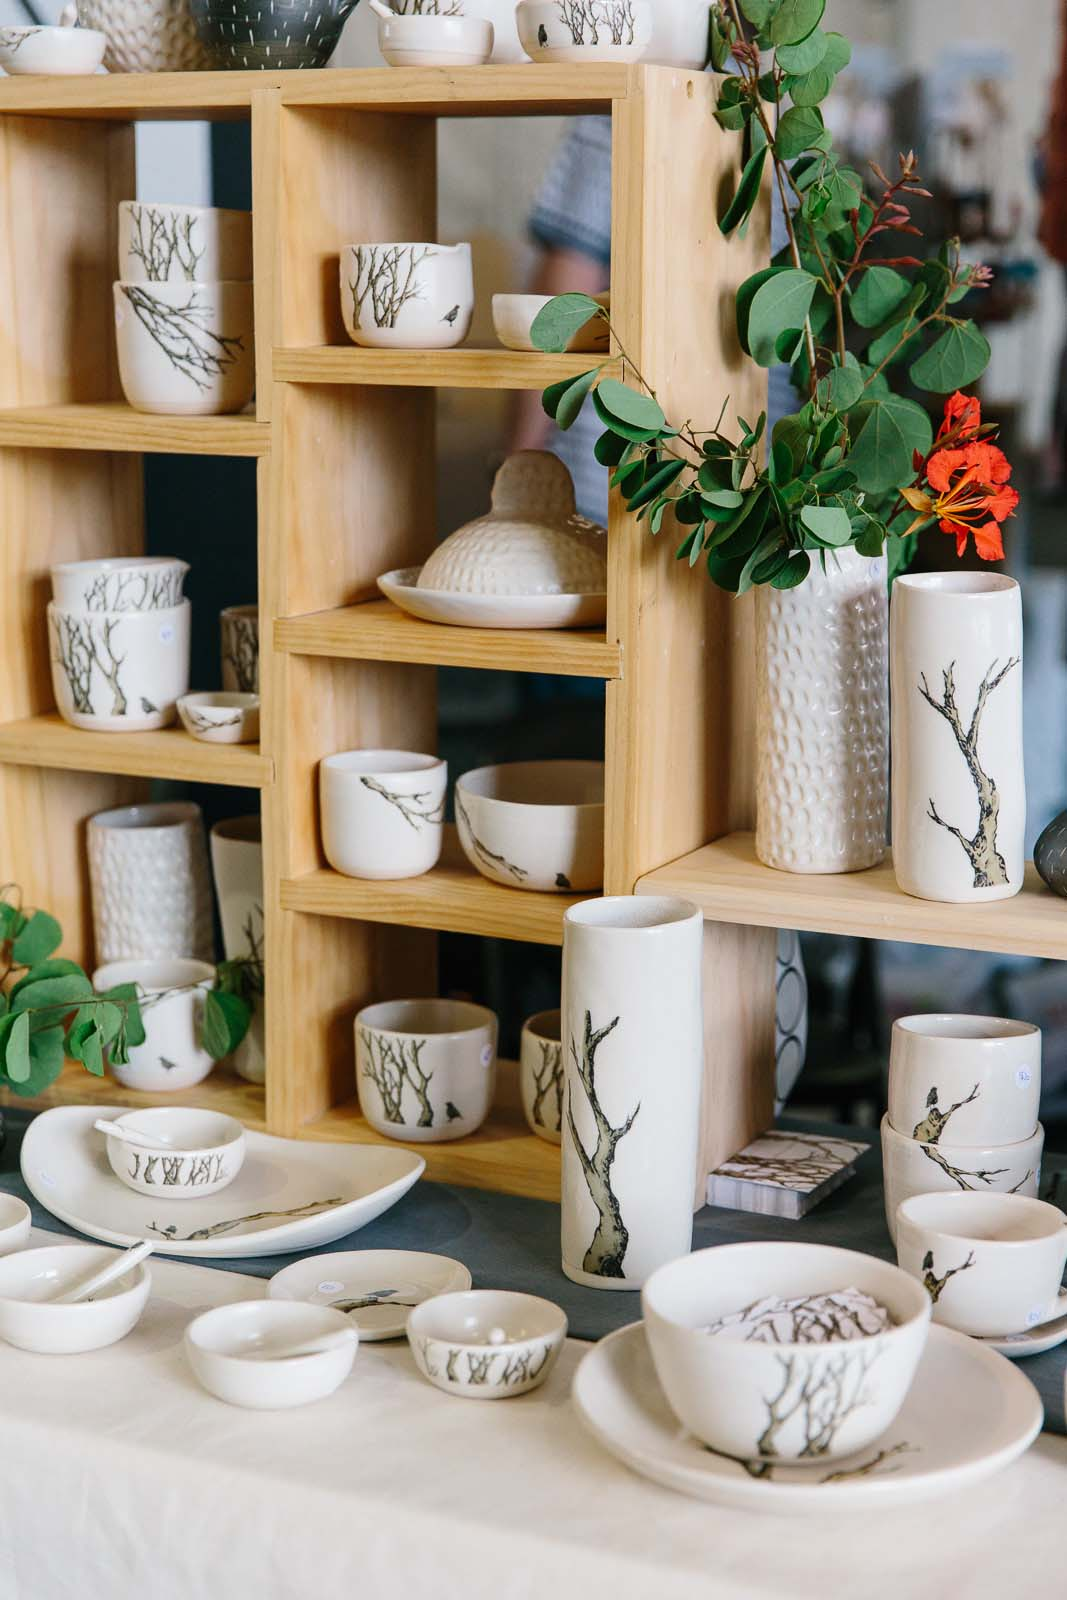 Ceramics stall set up